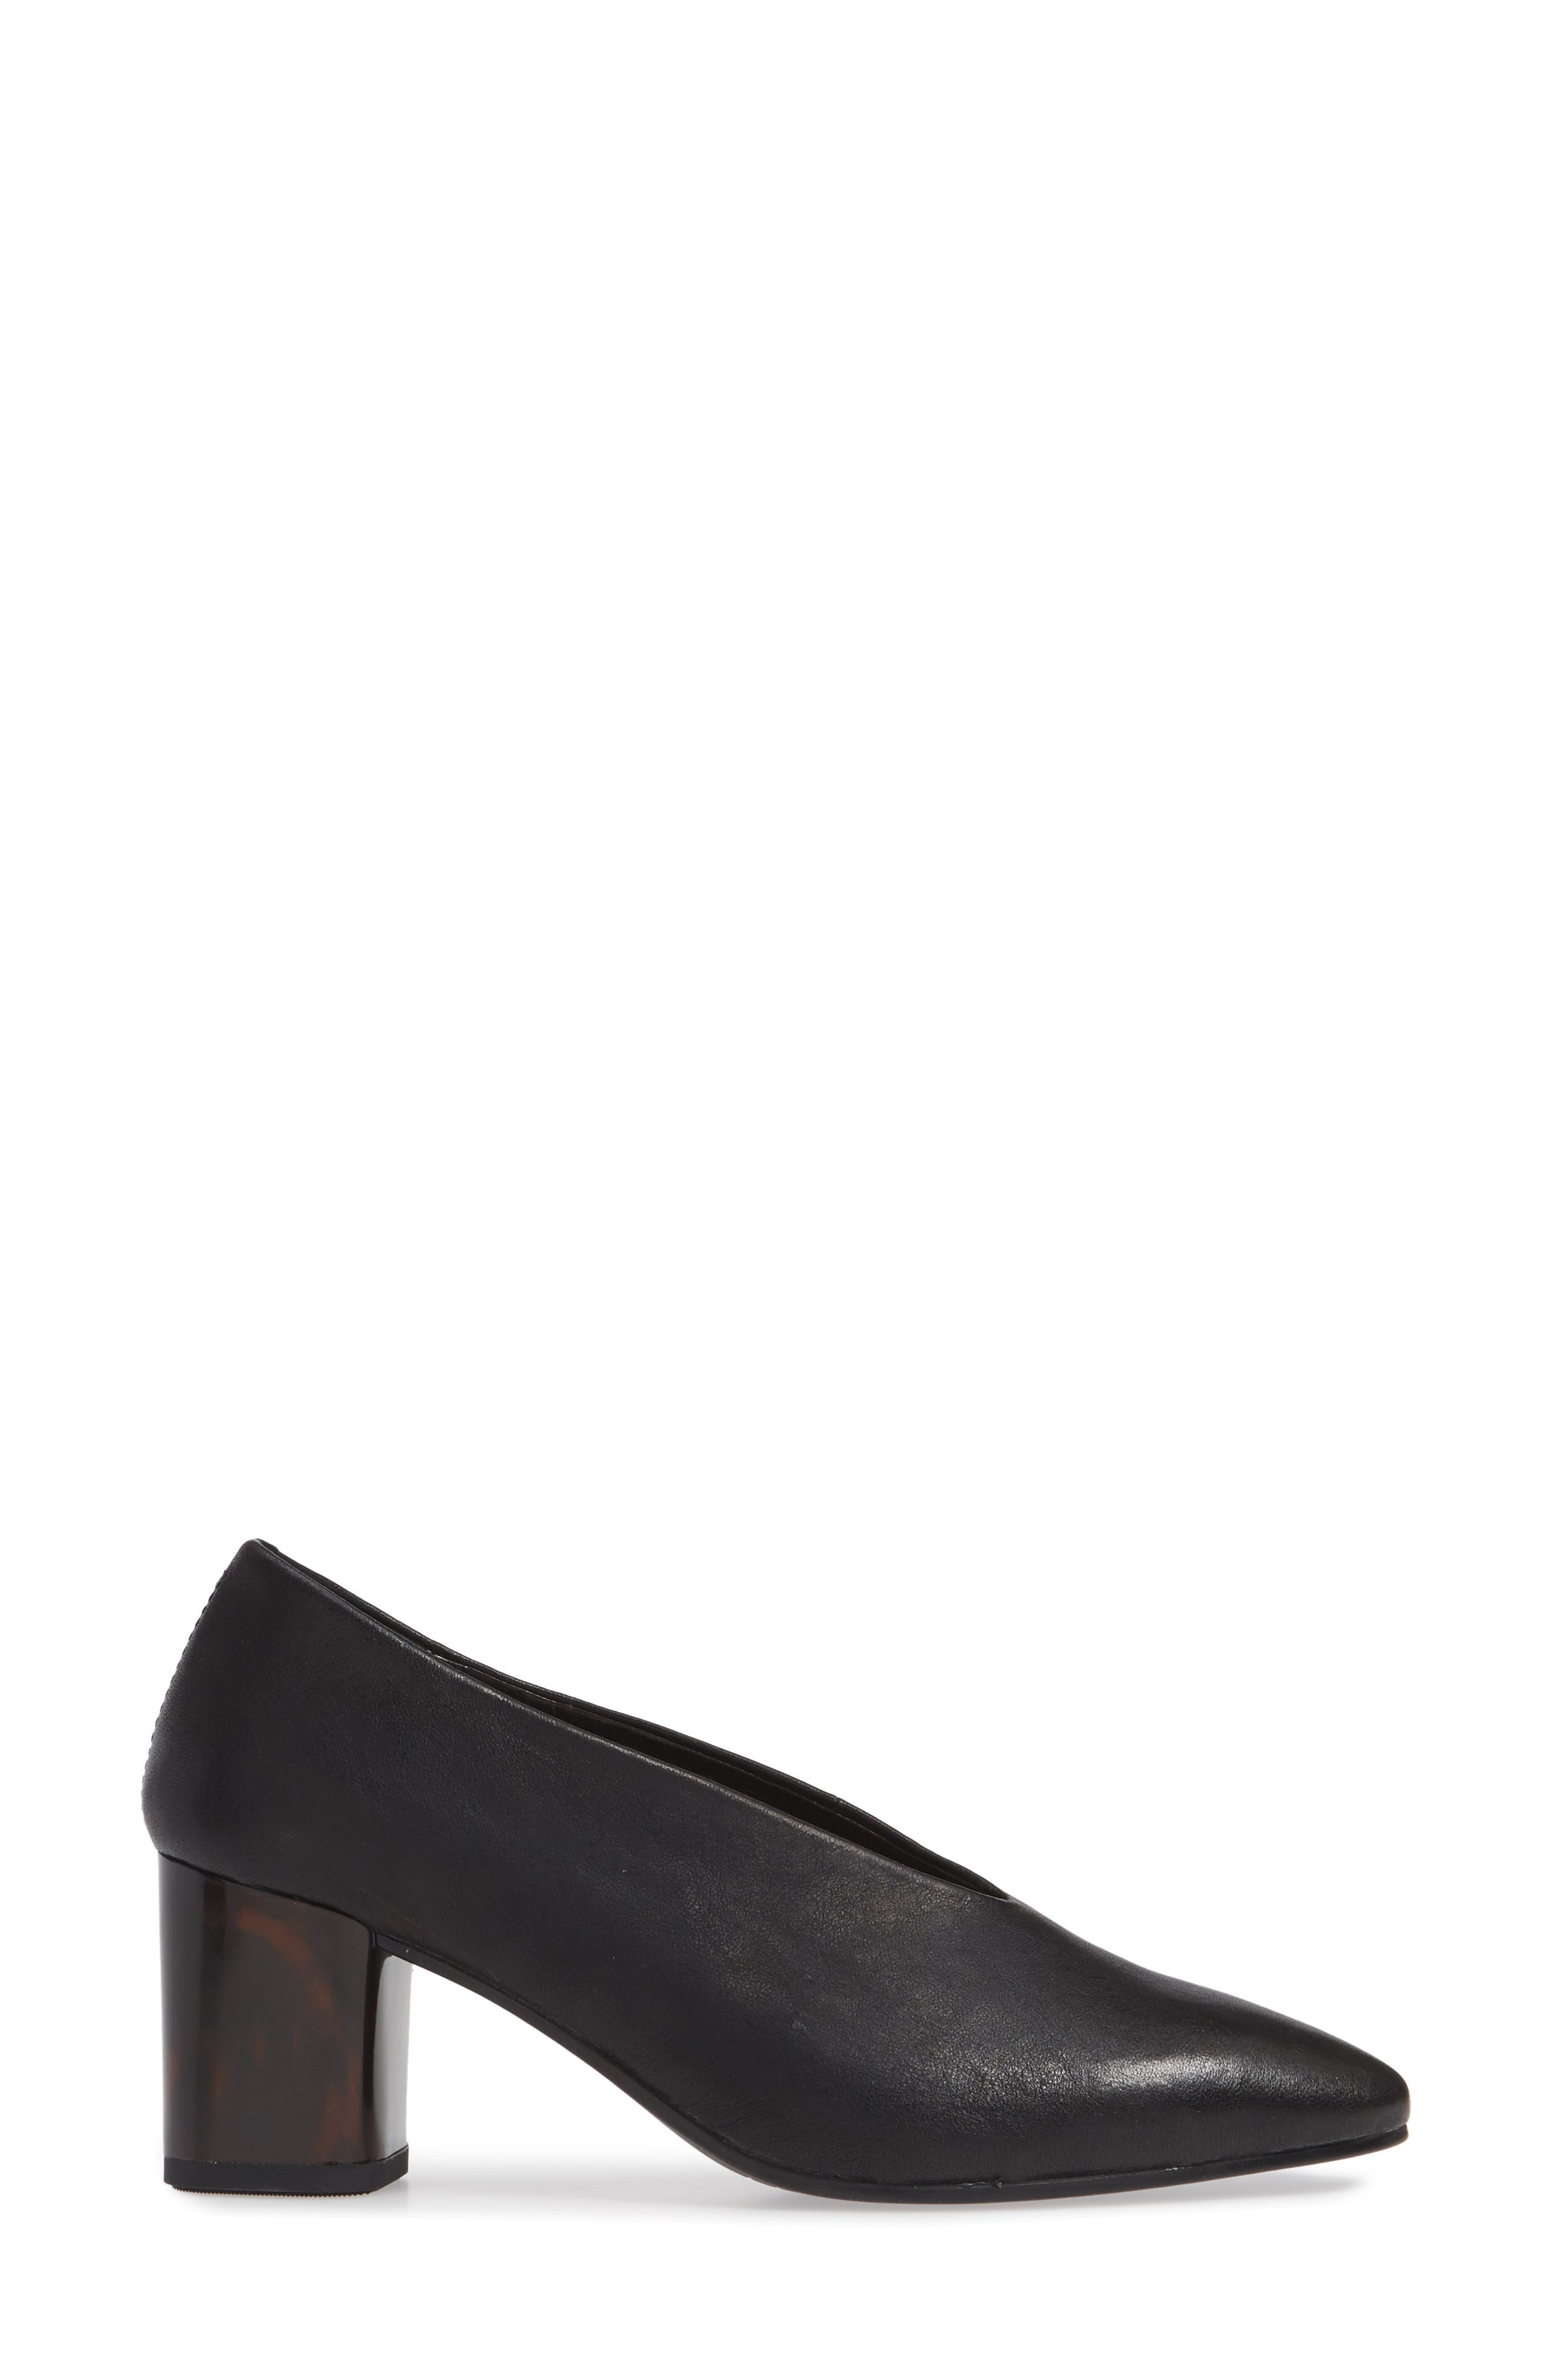 VAGABOND, Shoemakers Eve Pump, Alternate thumbnail 3, color, BLACK/ BLACK LEATHER